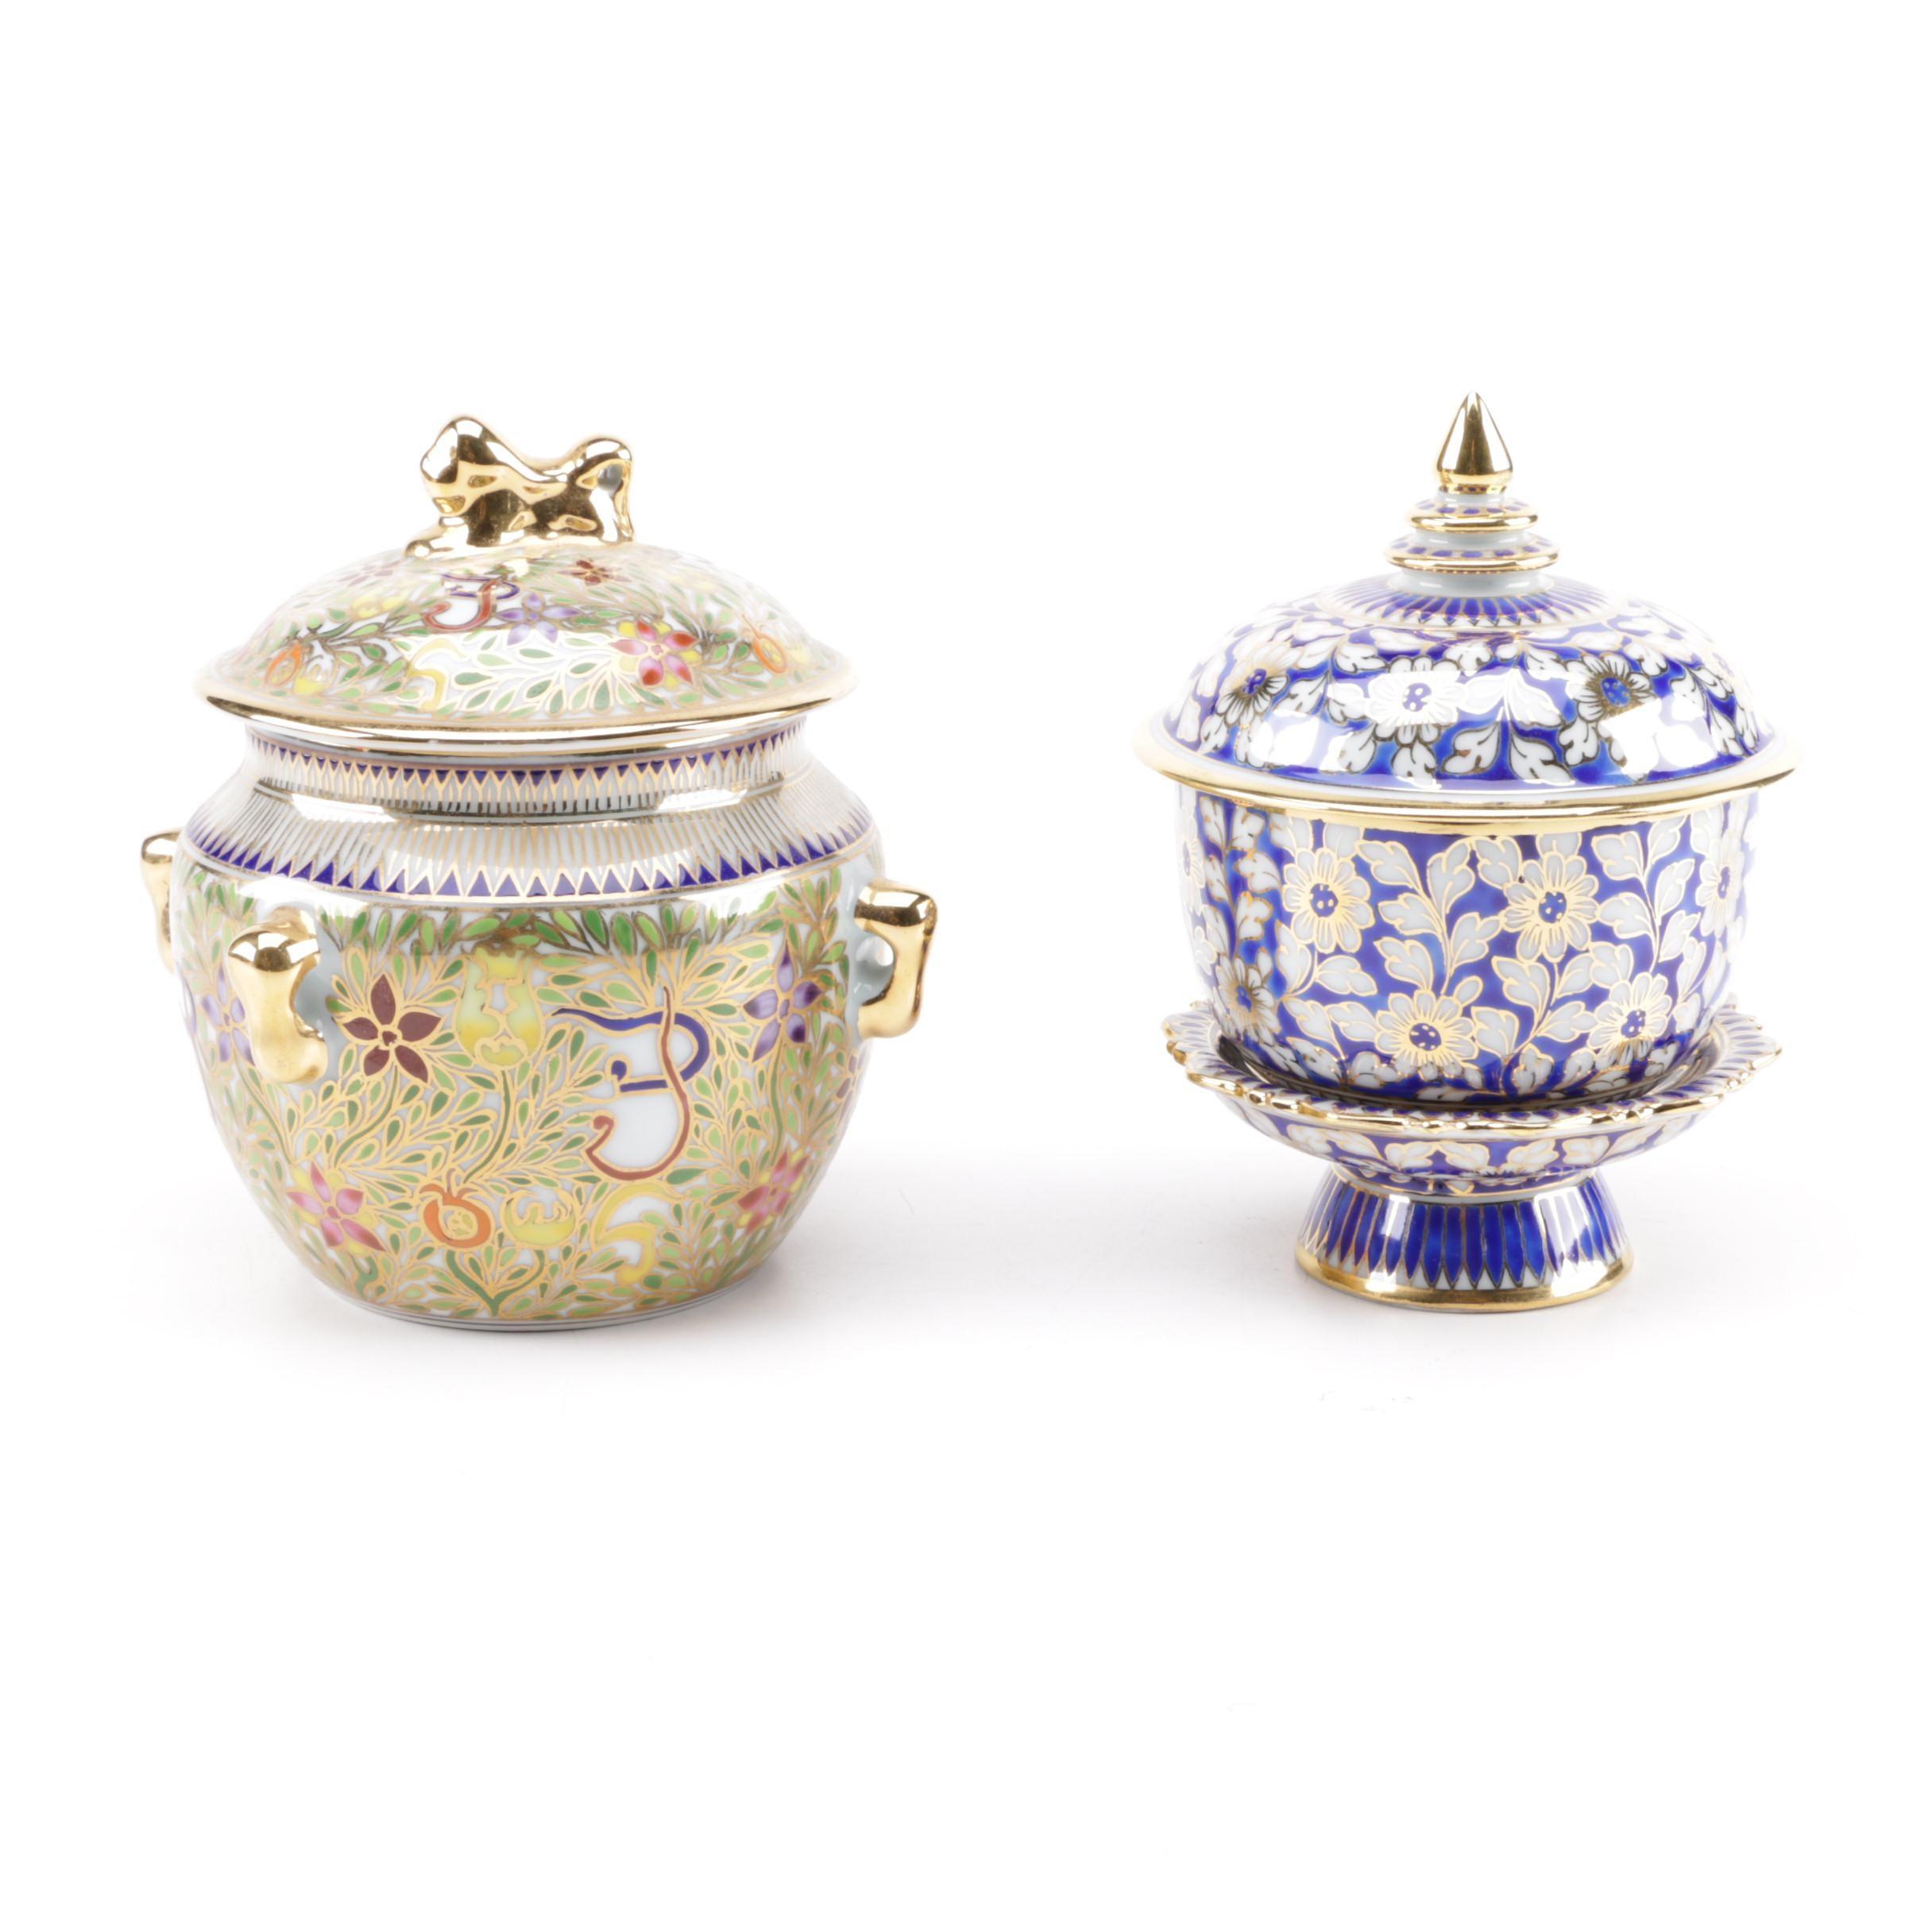 Hand-Painted Jars